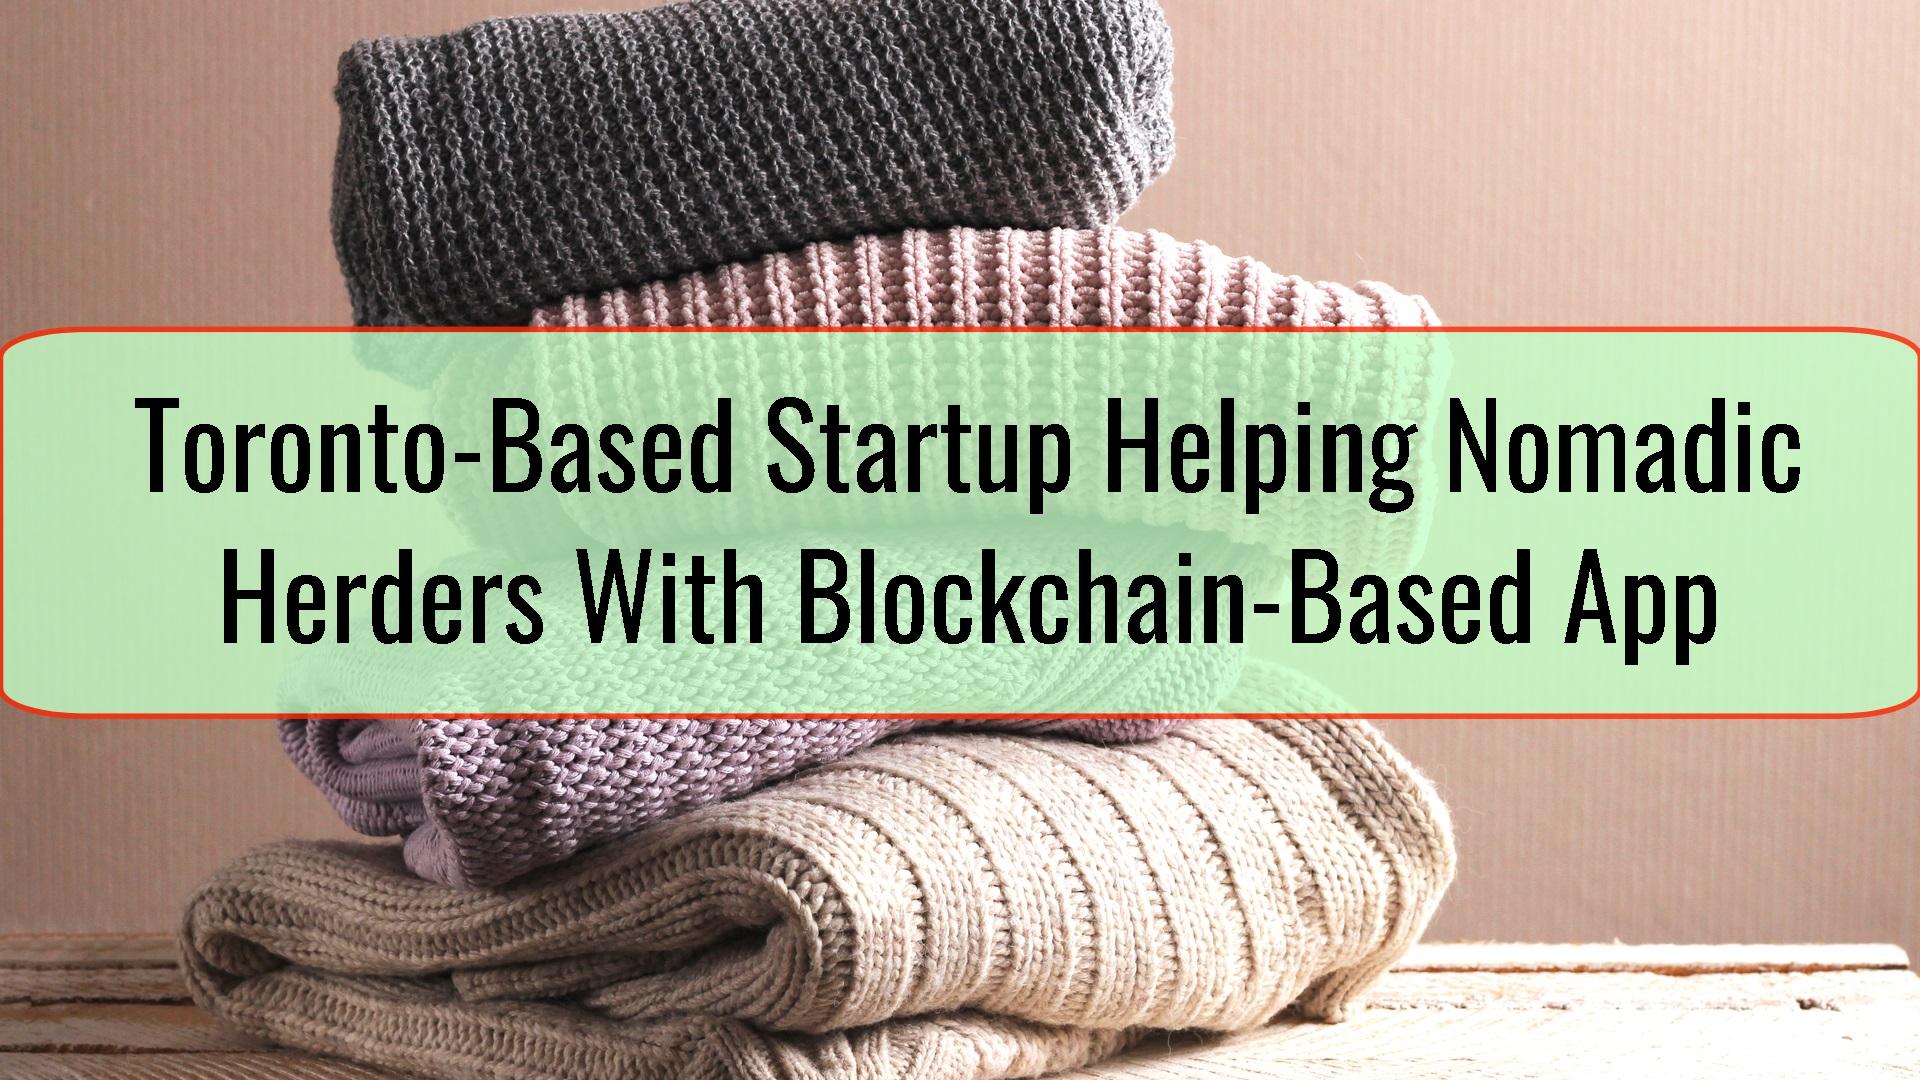 Toronto-Based Startup Helping Nomadic Herders With Blockchain-Based App